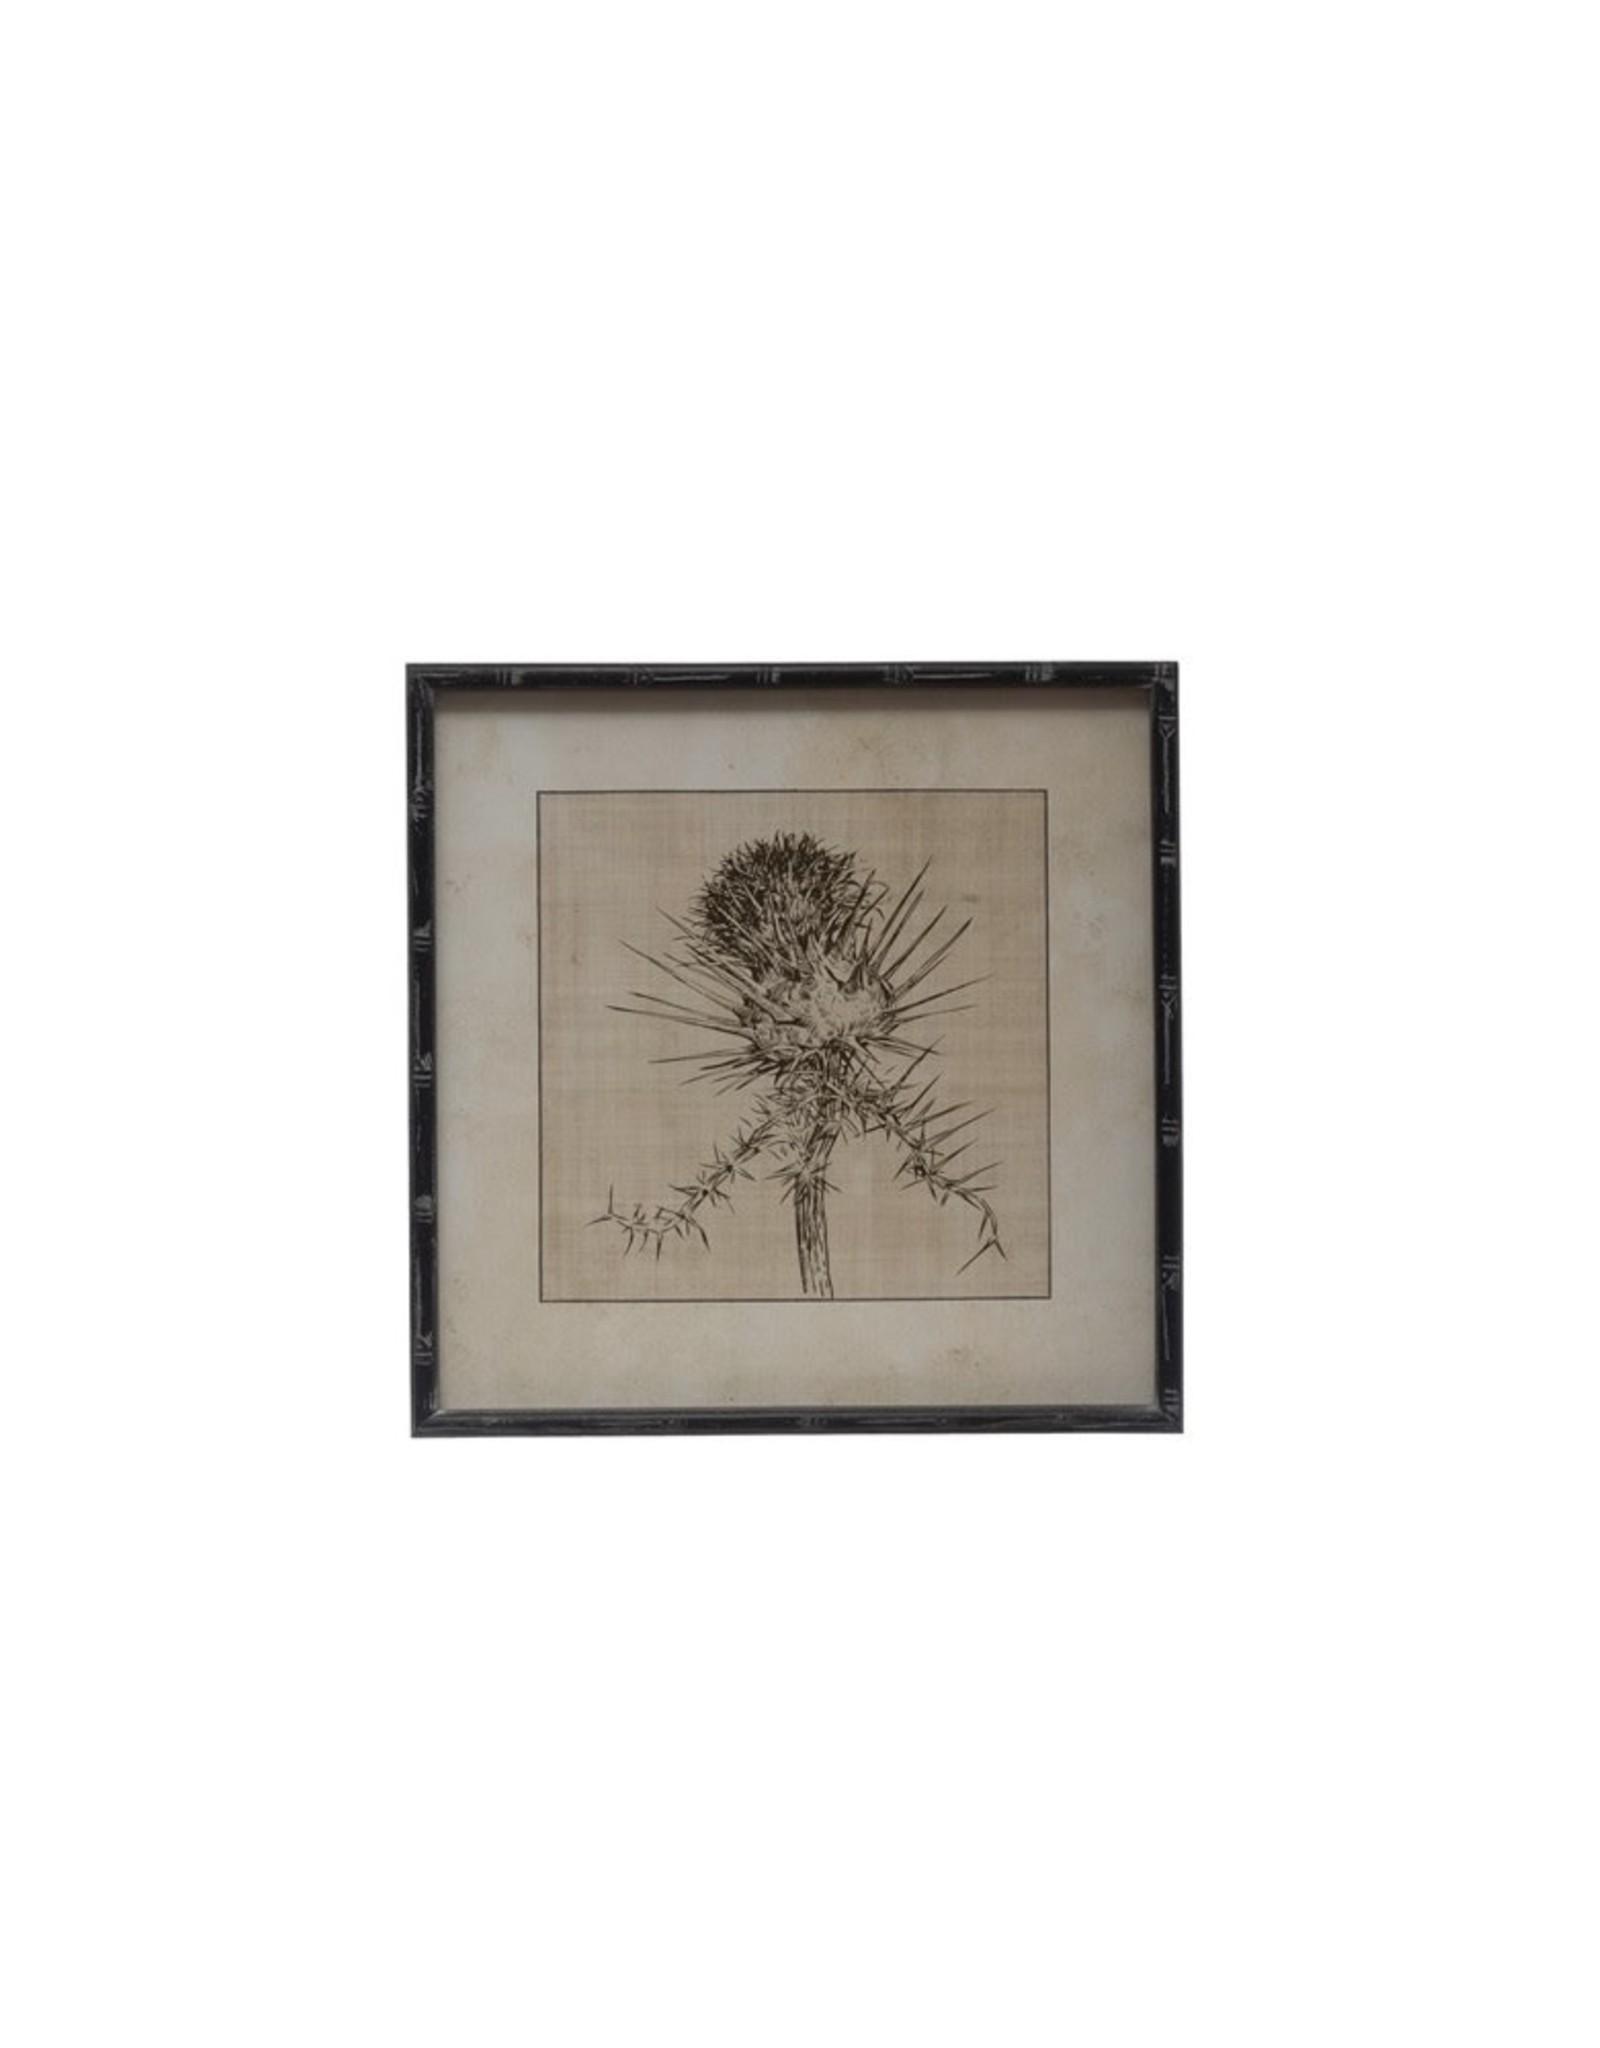 "Creative Co-op 20"" Square Wood Framed Wall Art - Dried Botanical"